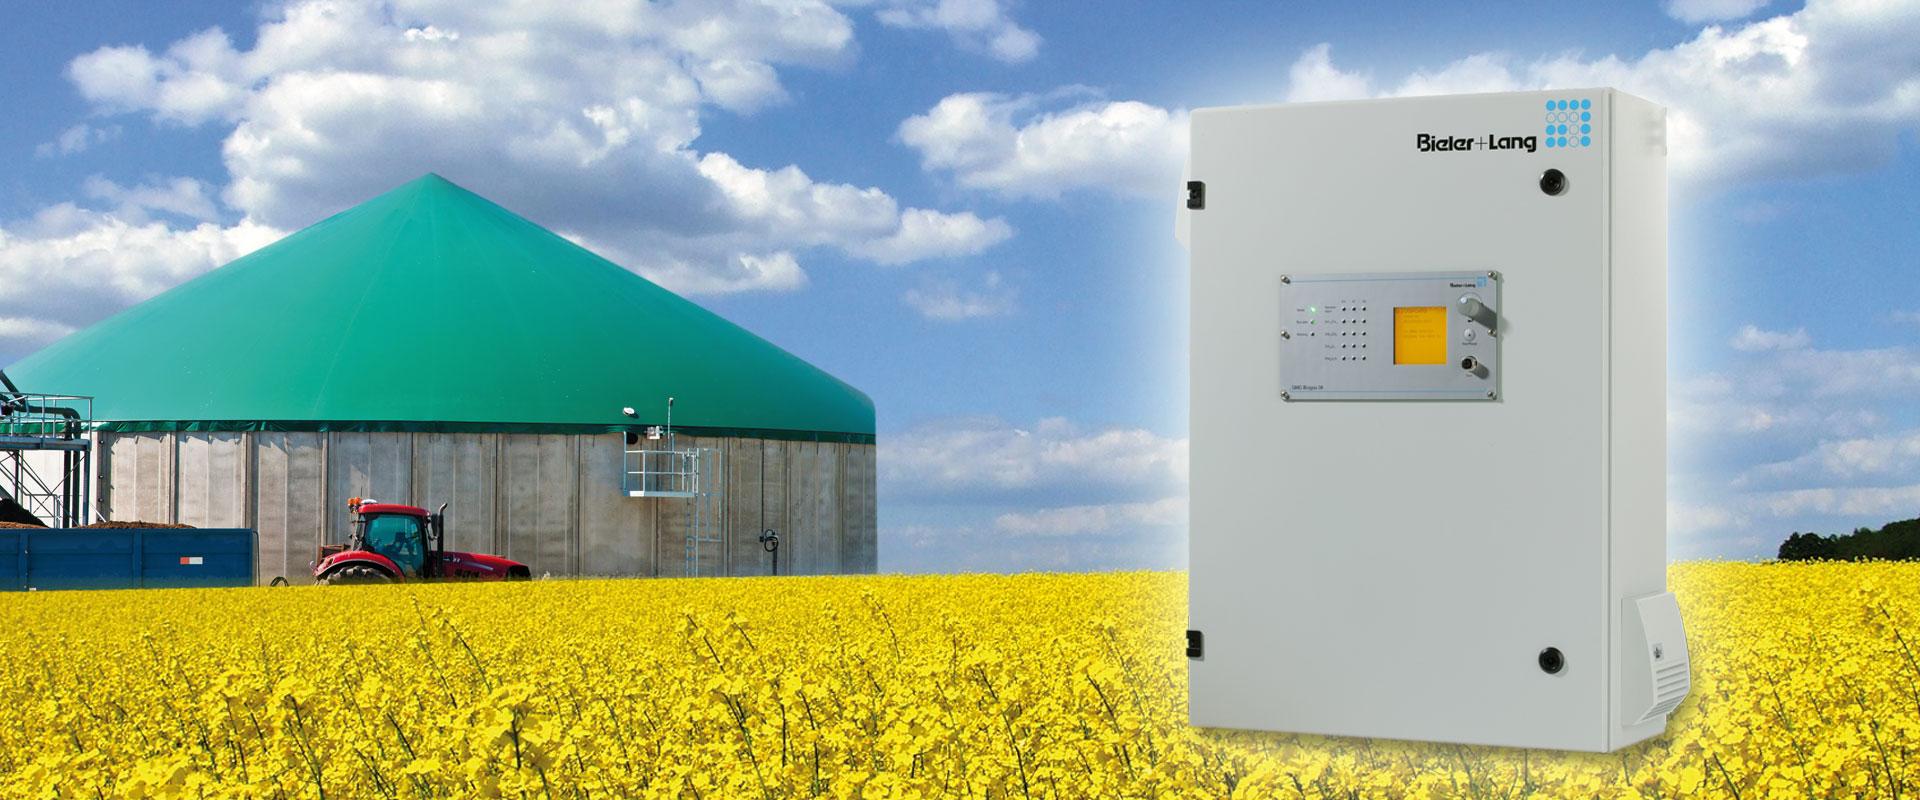 Bieler+Lang: Biogas Analysegerät GMC Biogas 08